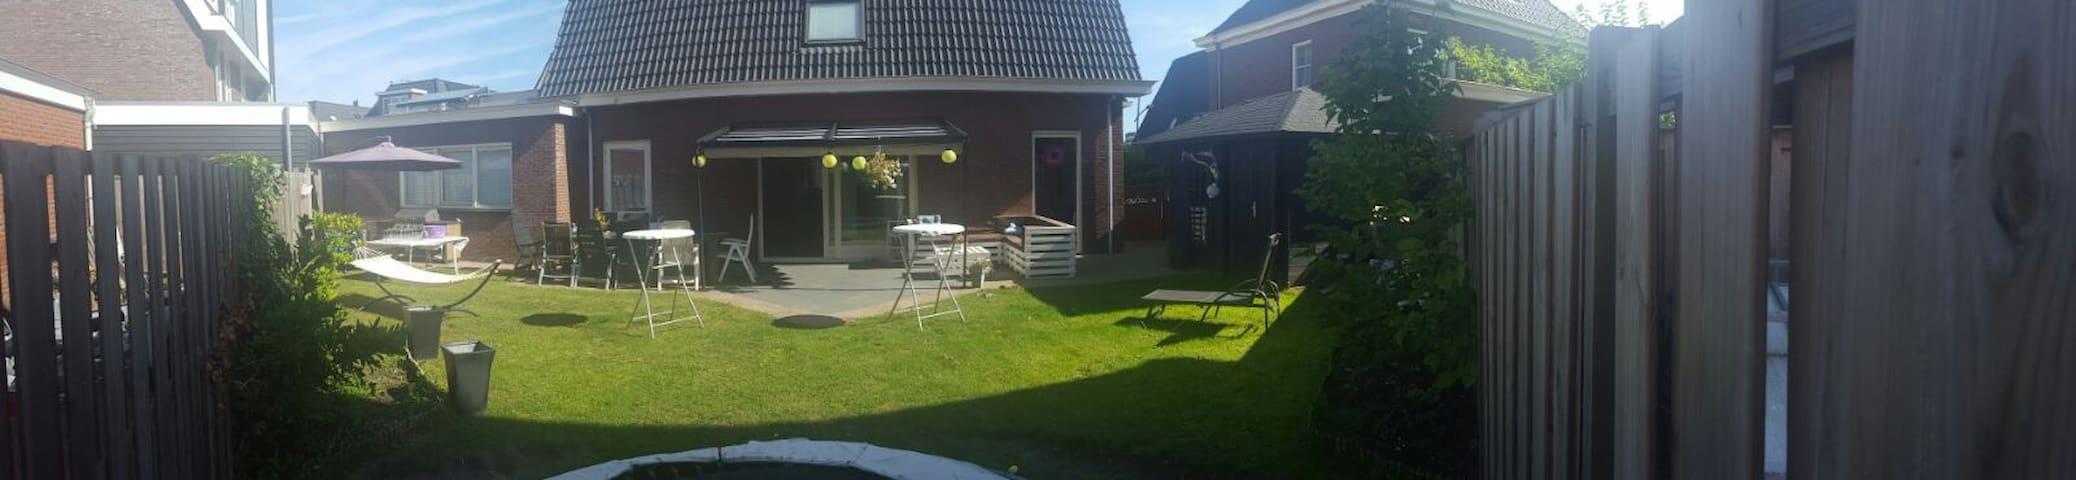 Wonderful house with sunny garden near Amsterdam